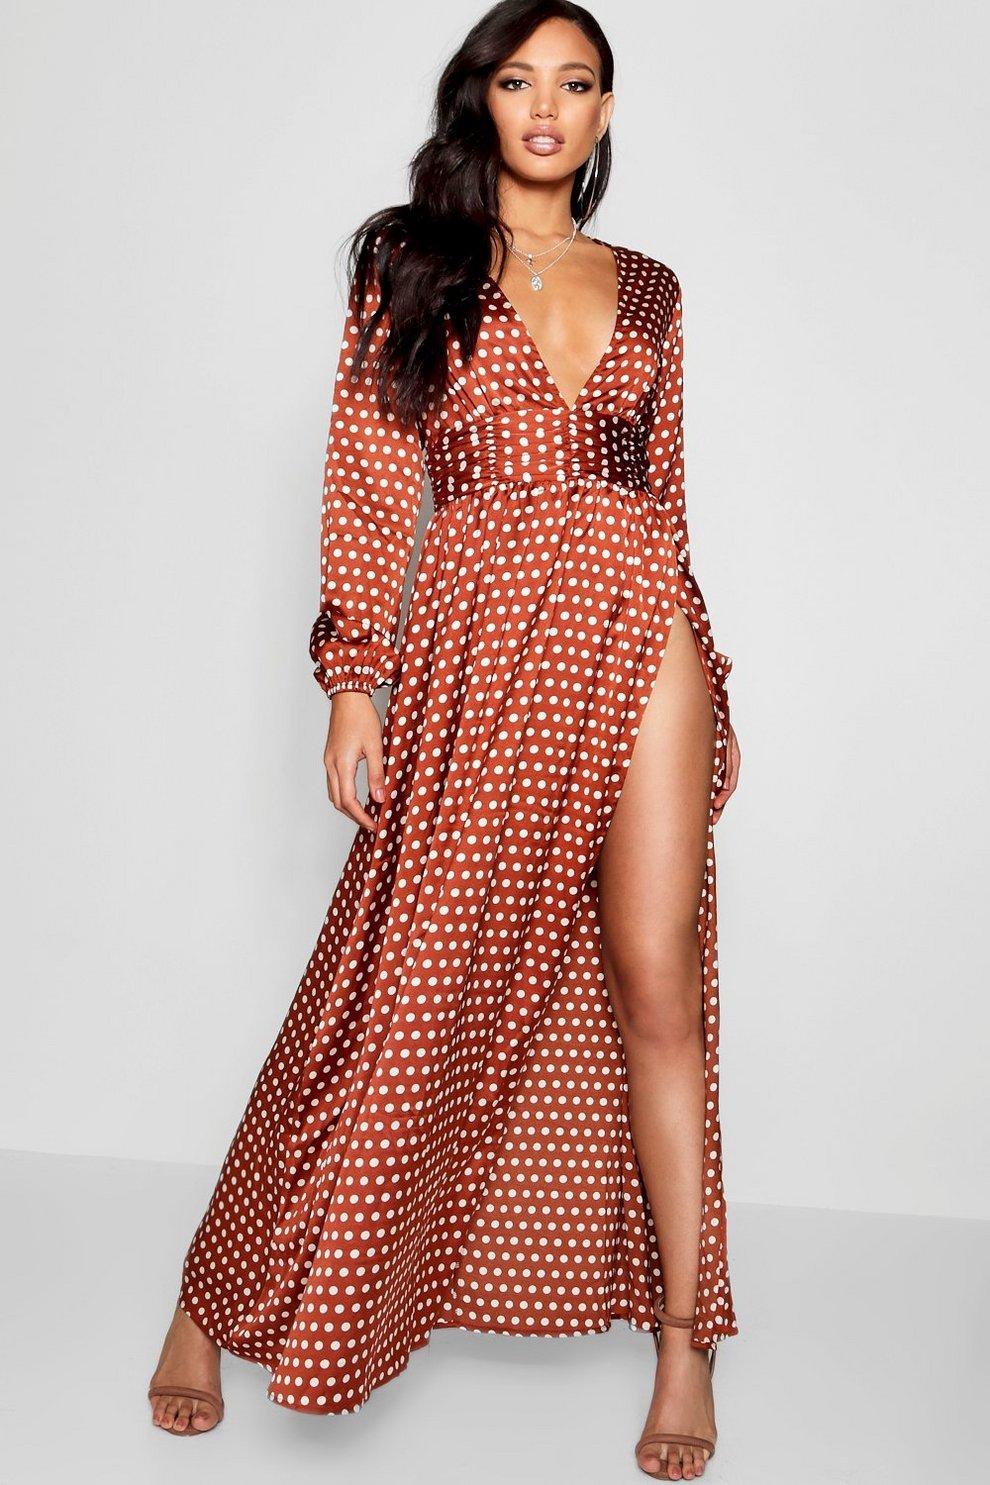 e8d7cd9525a9cc Polka Dot Plunge Neck Maxi Dress